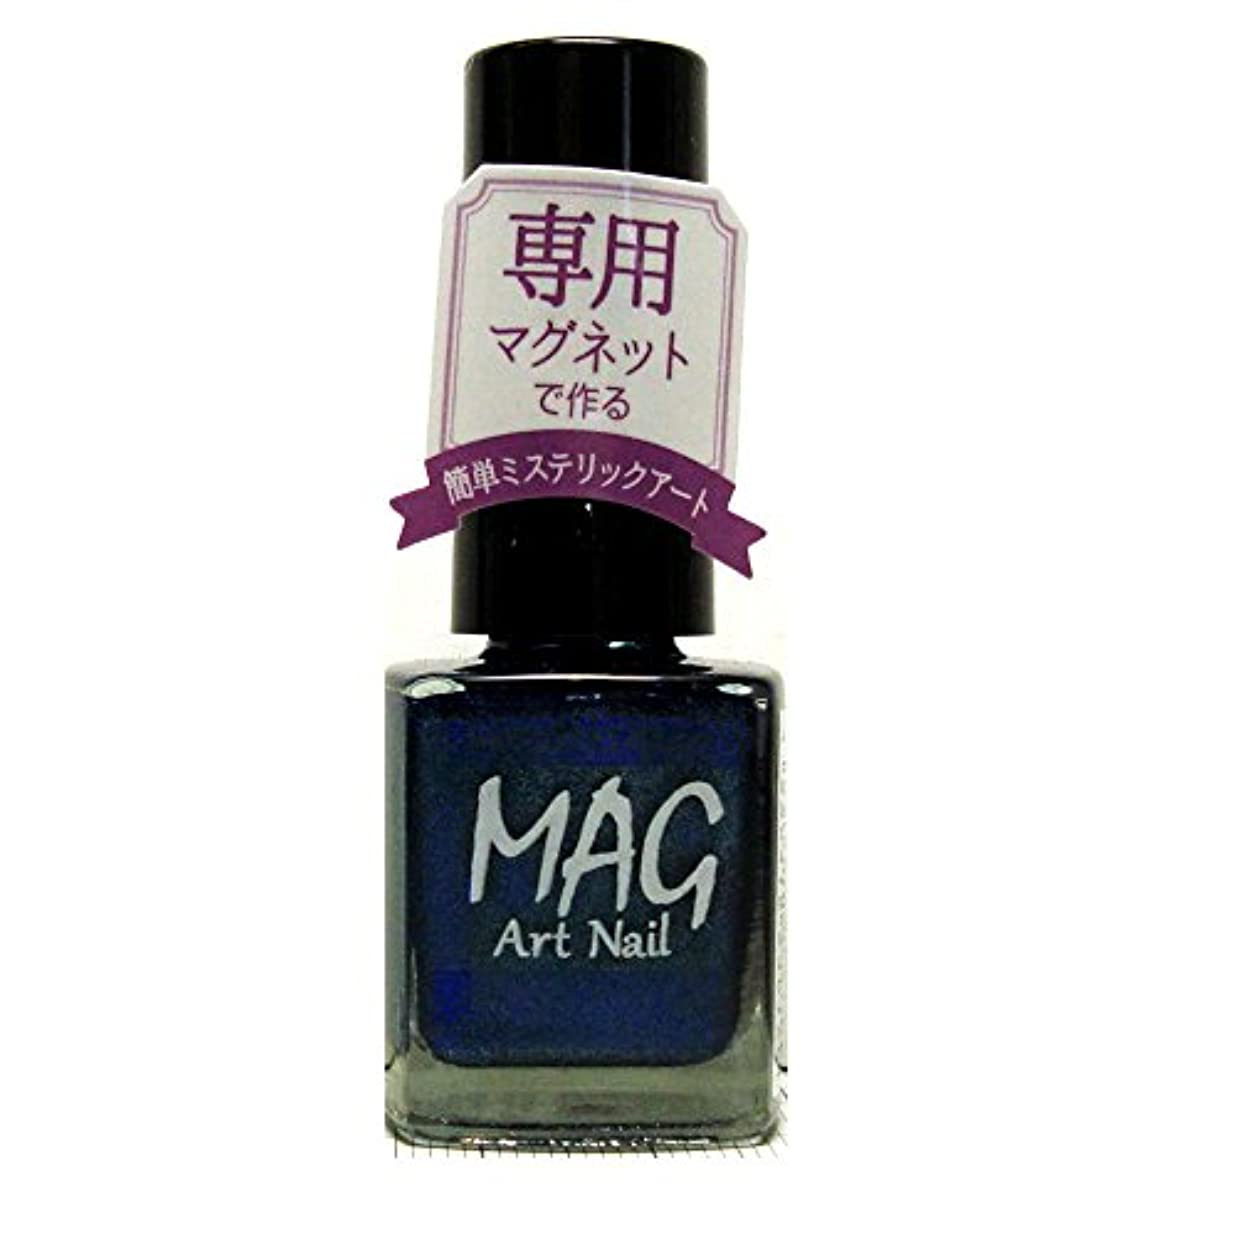 TMマグアートネイル(爪化粧料) TMMA1605 ナイトブルー